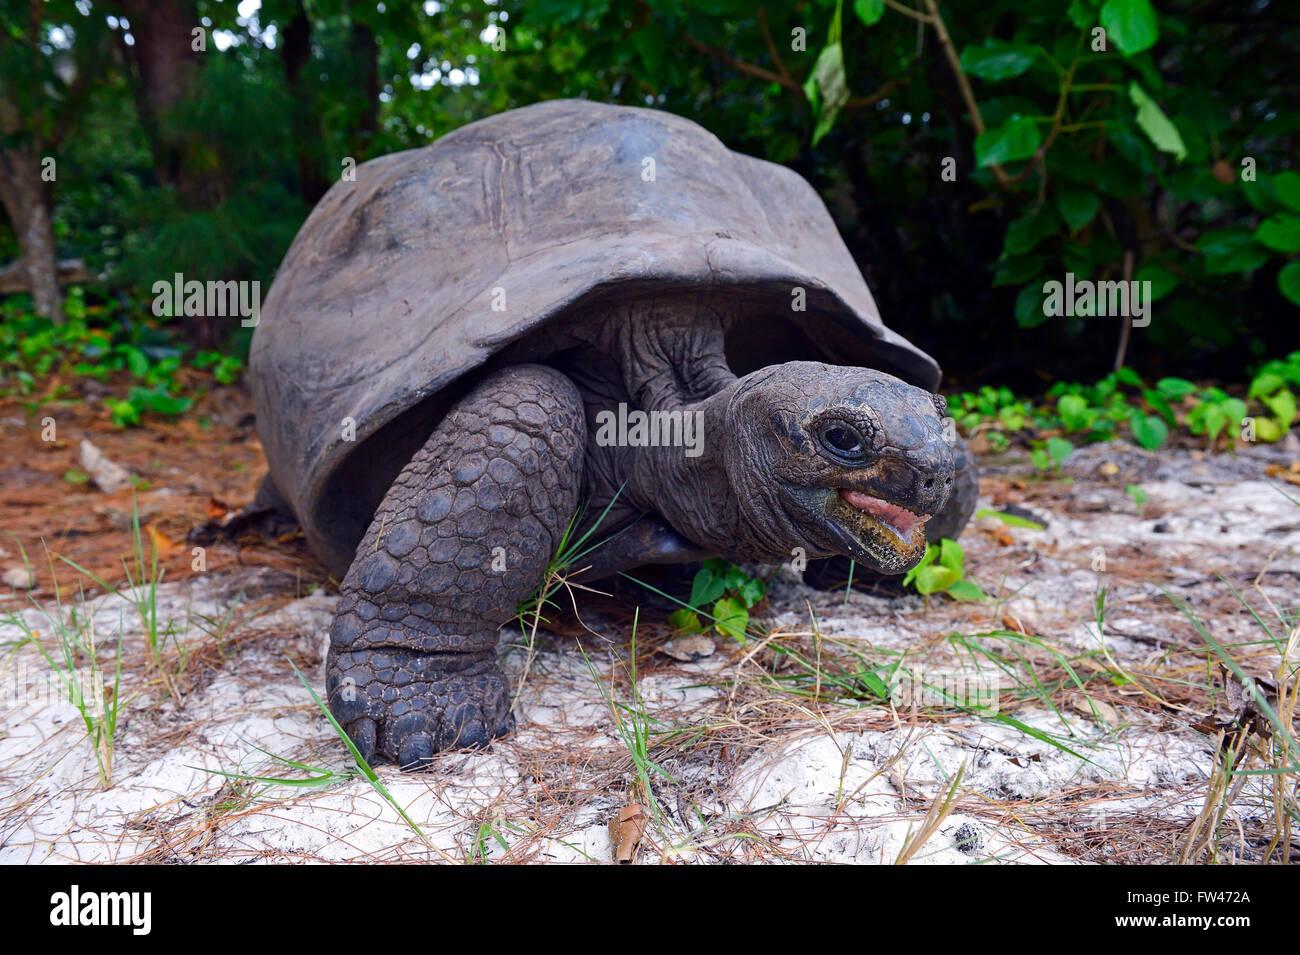 Aldabra-Riesenschildkroeten (Geochelone gigantea), endemisch, Insel Curieuse, Seychellen - Stock Image